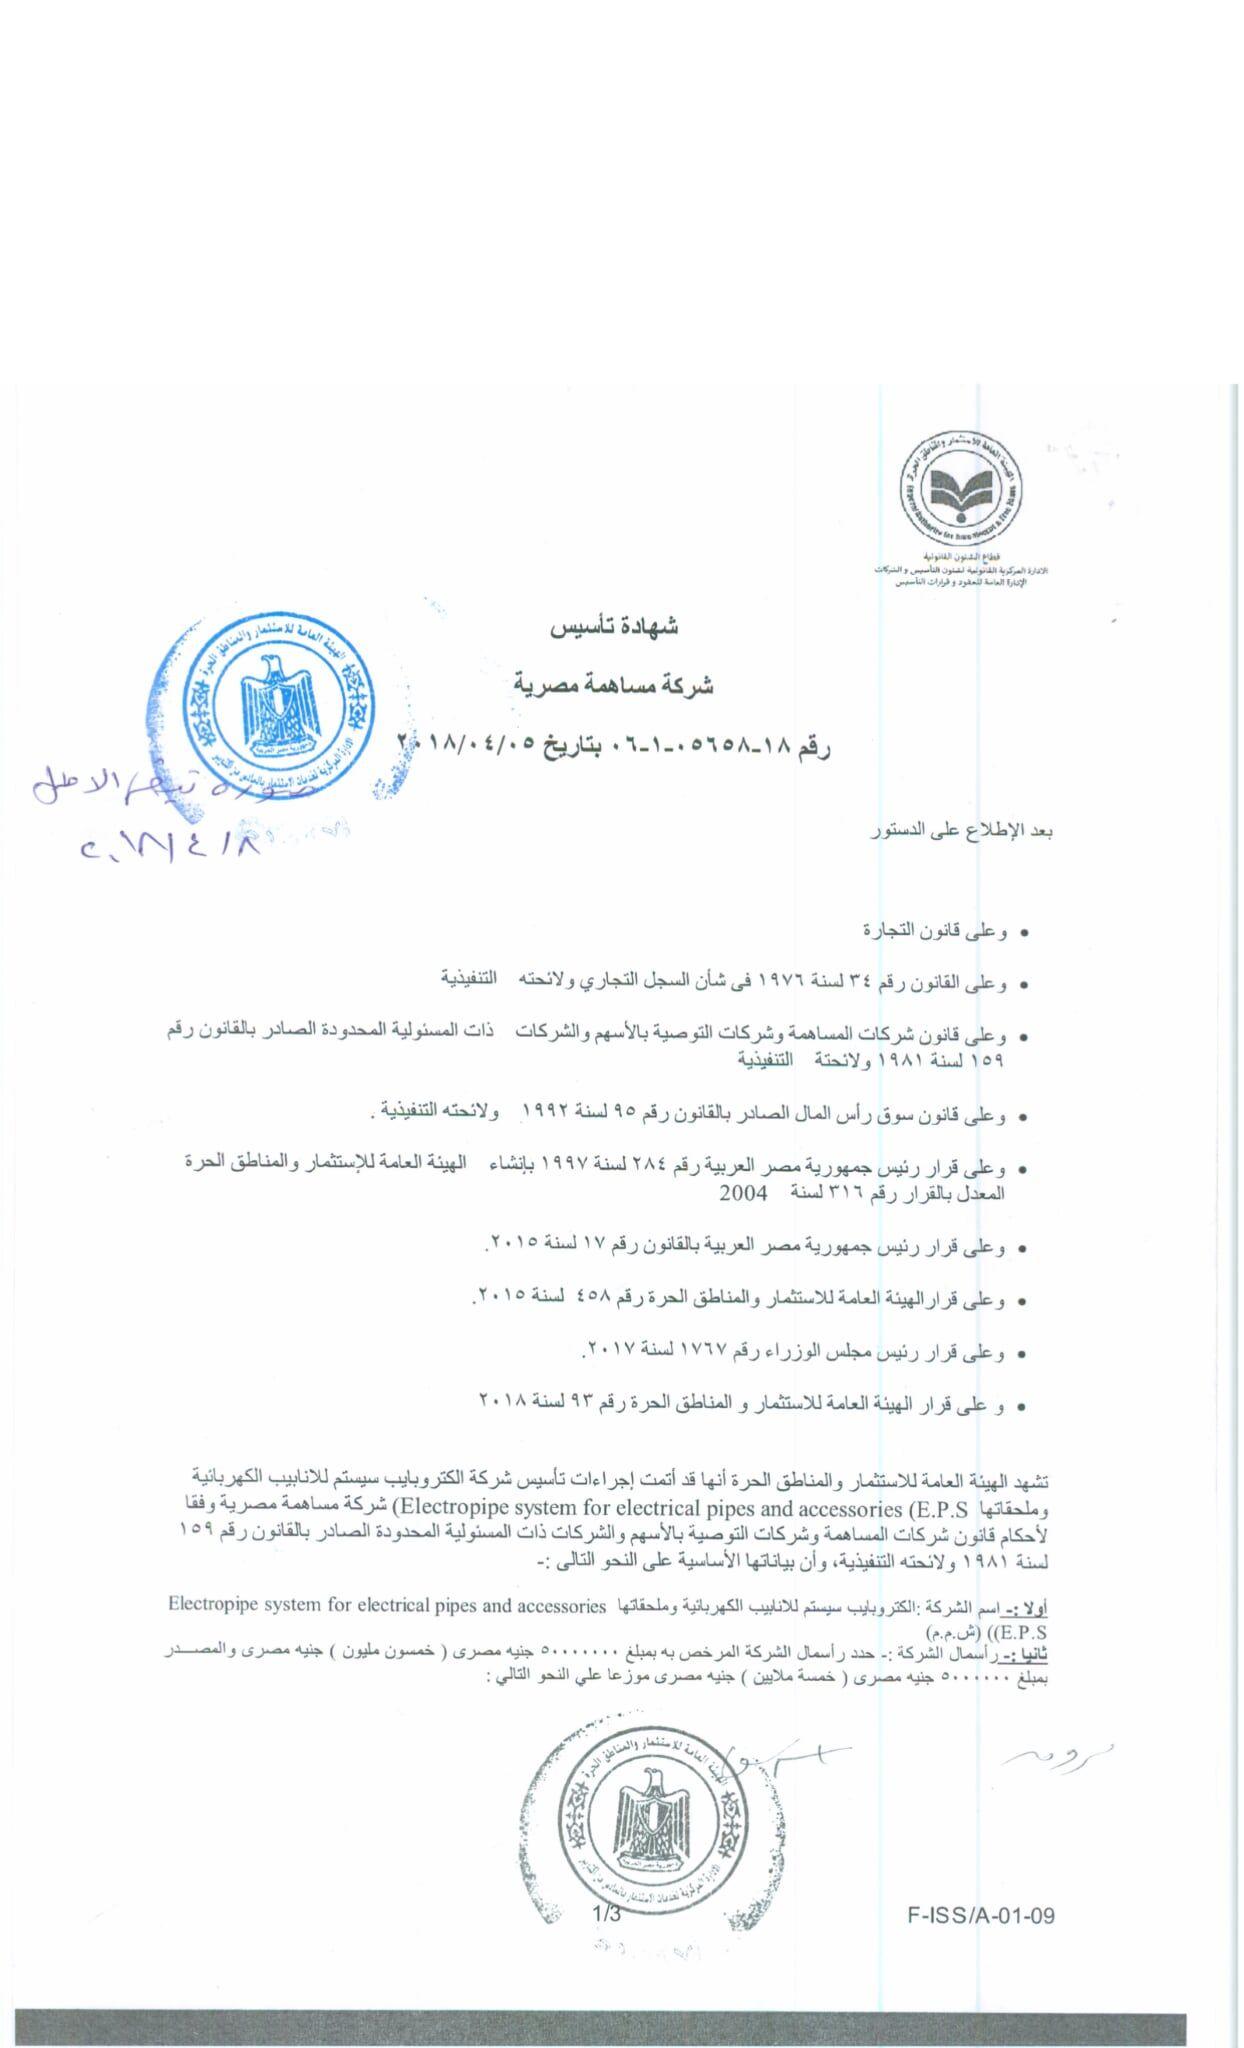 عقد تأسيس الشركة Pdf Onedrive Social Security Card Islamic Art Cards